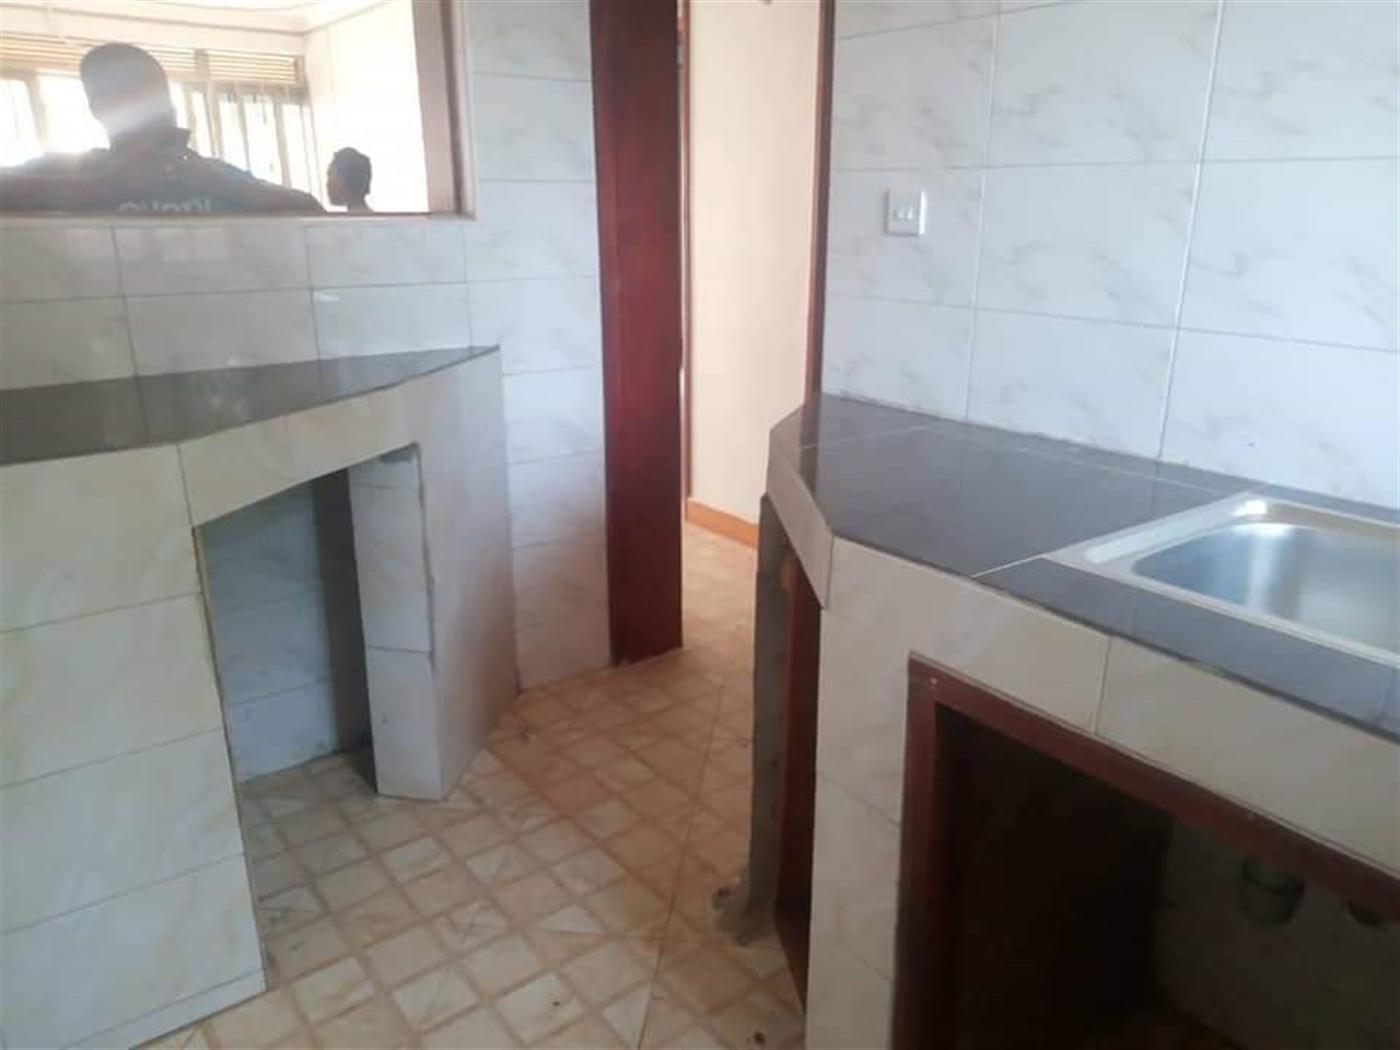 Apartment for rent in Namugongo Wakiso